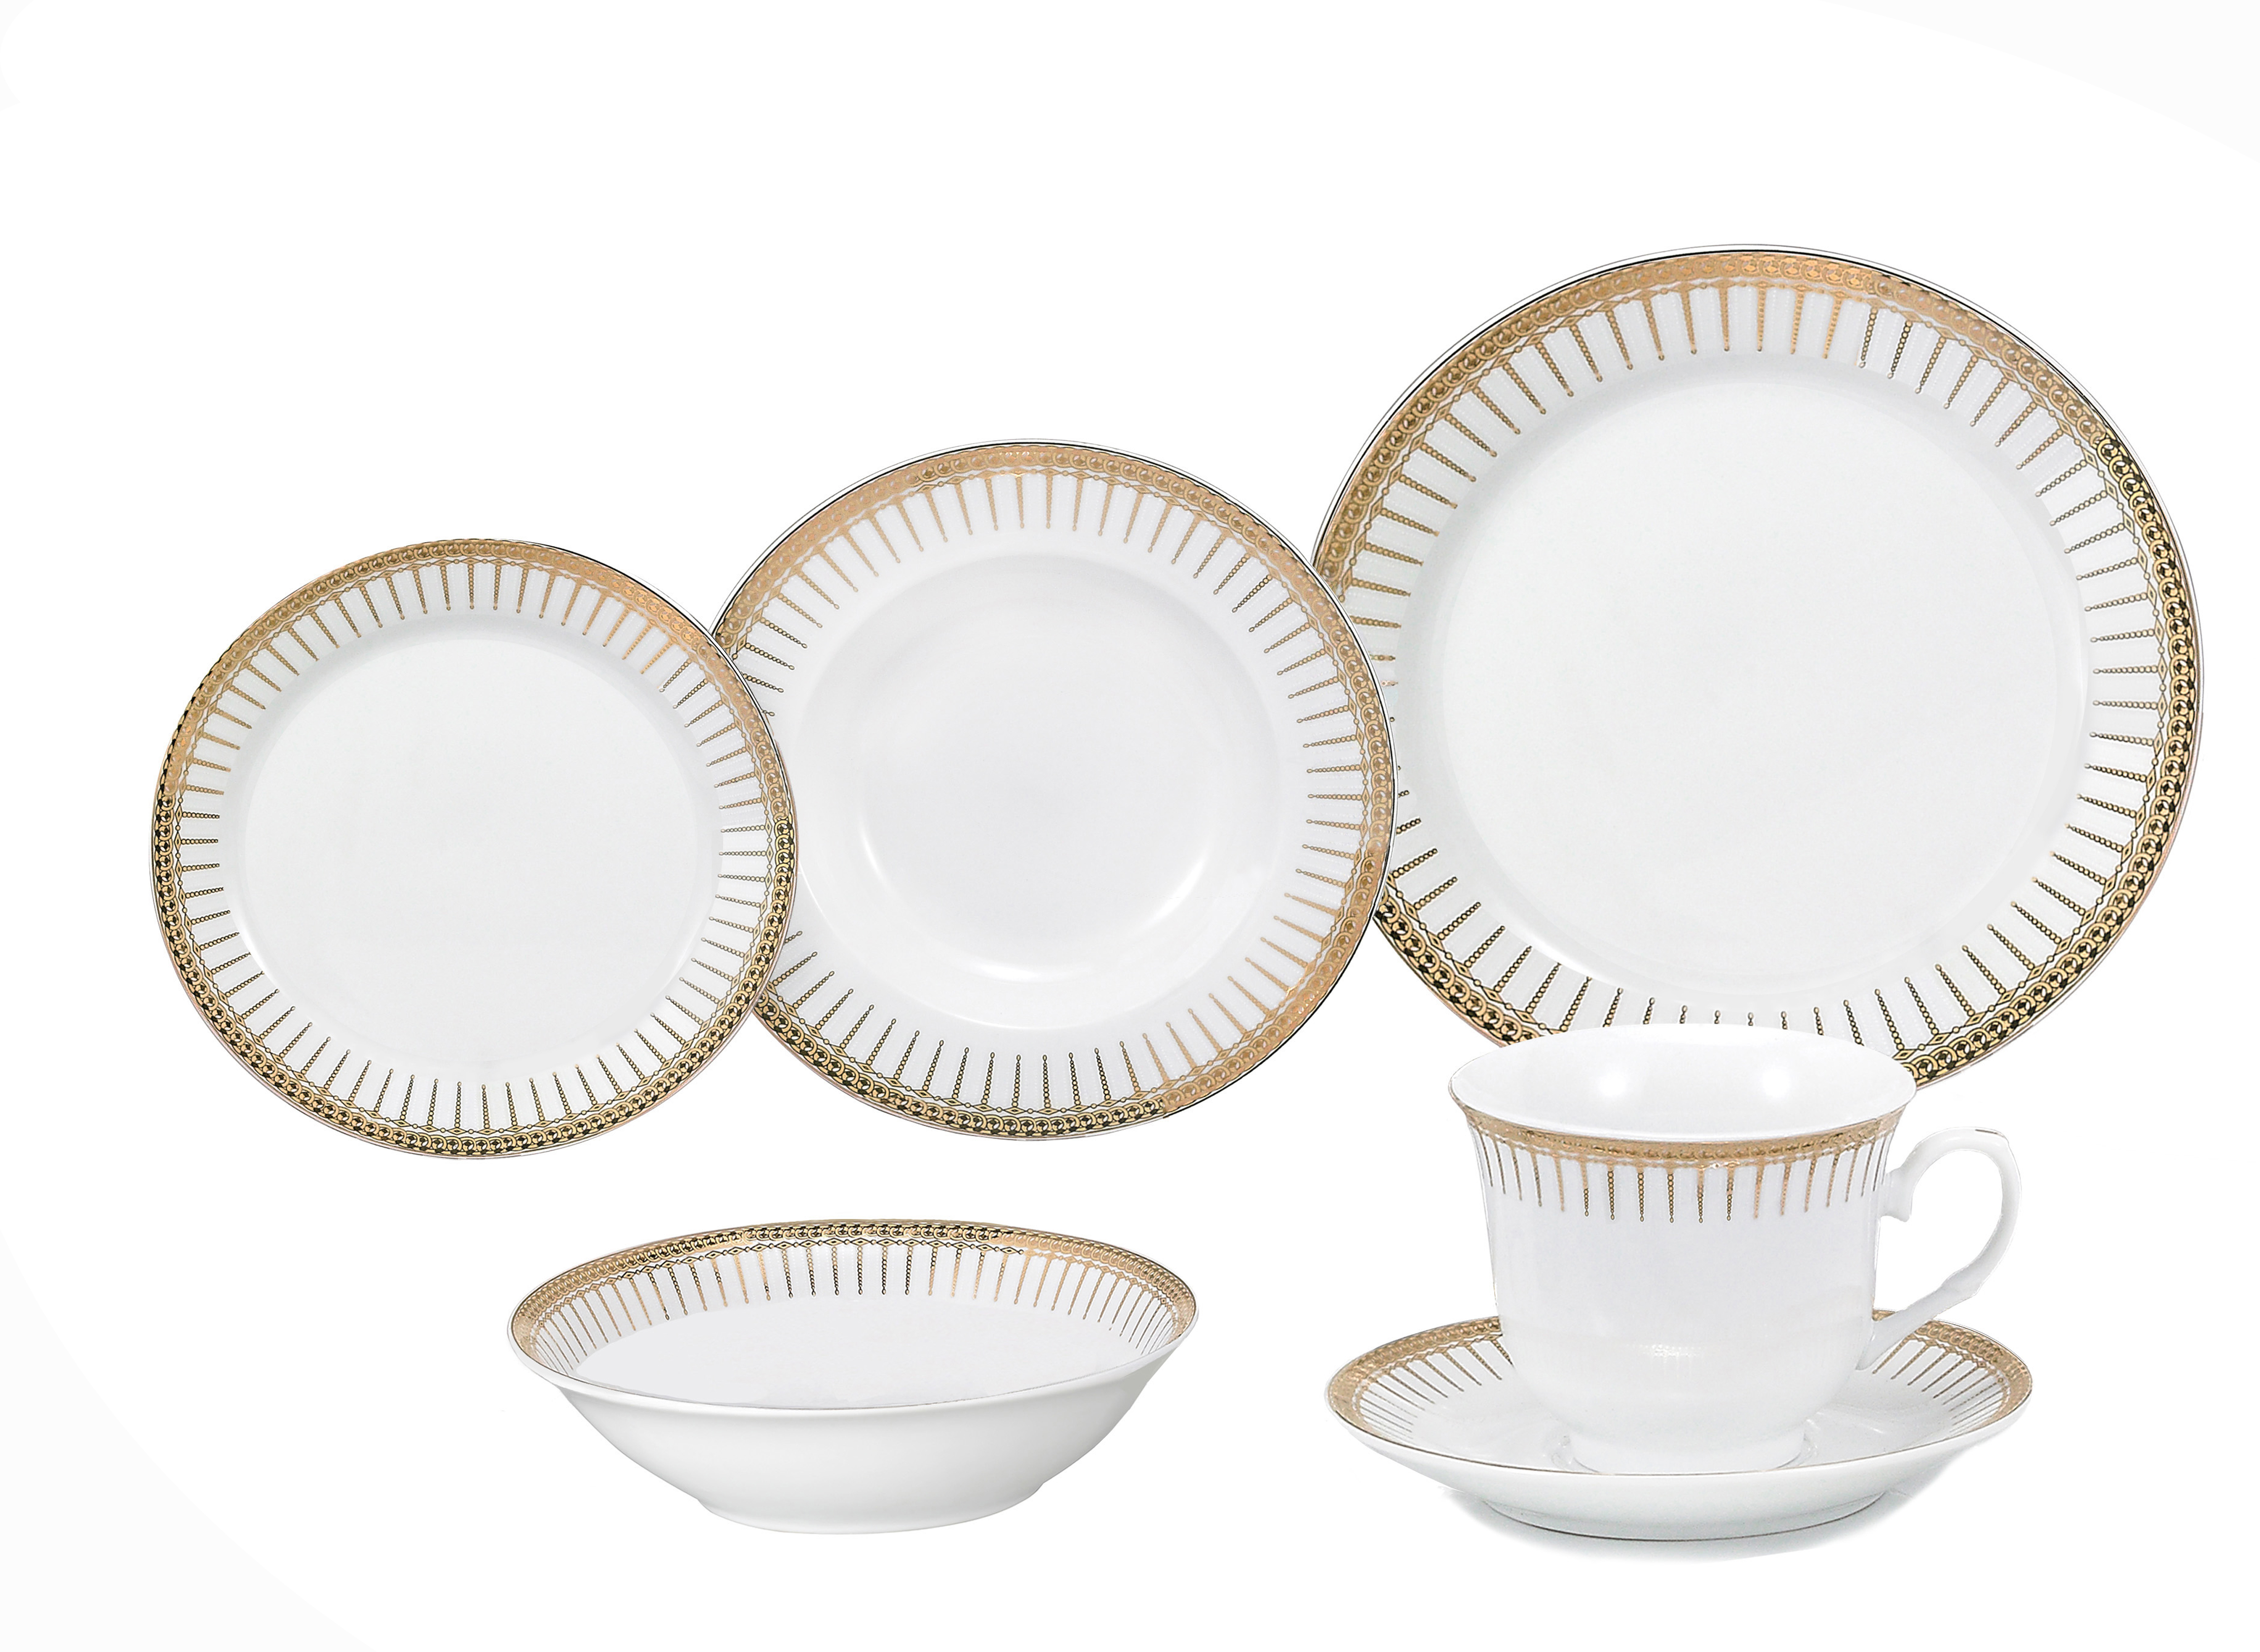 porcelain dinnerware set, 24 piece service for 4lorren home